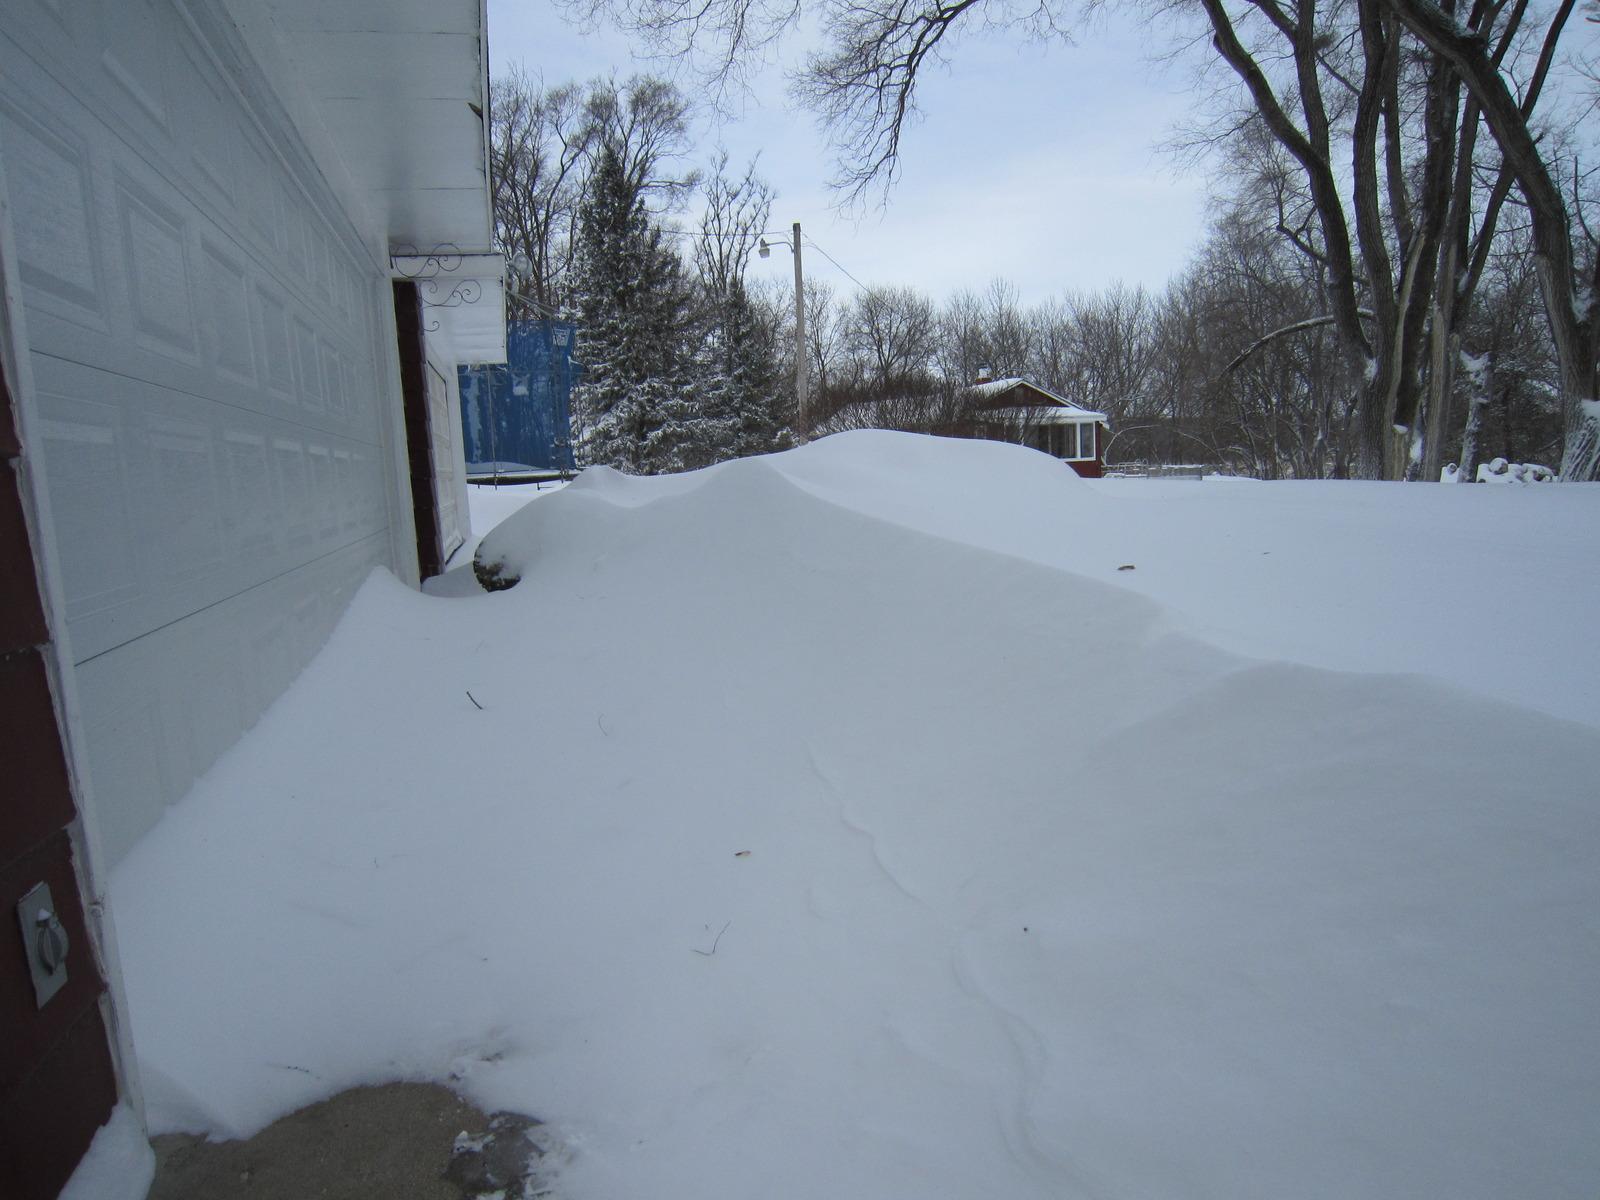 Blizzard feb 2 2011 (2)